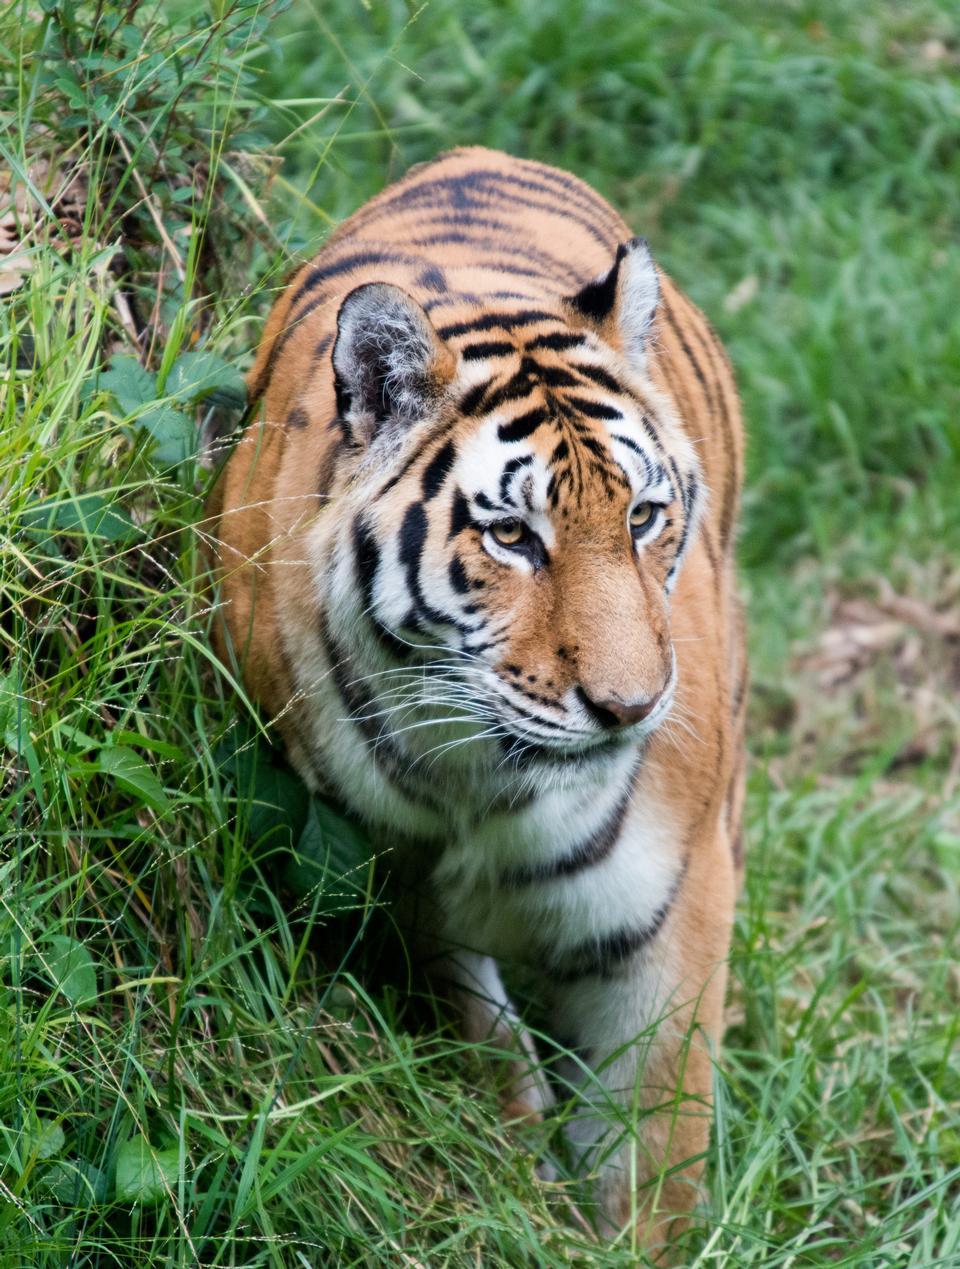 Head Shot di tigre di Sumatra in erba Panthera Tirgris Sumatrae